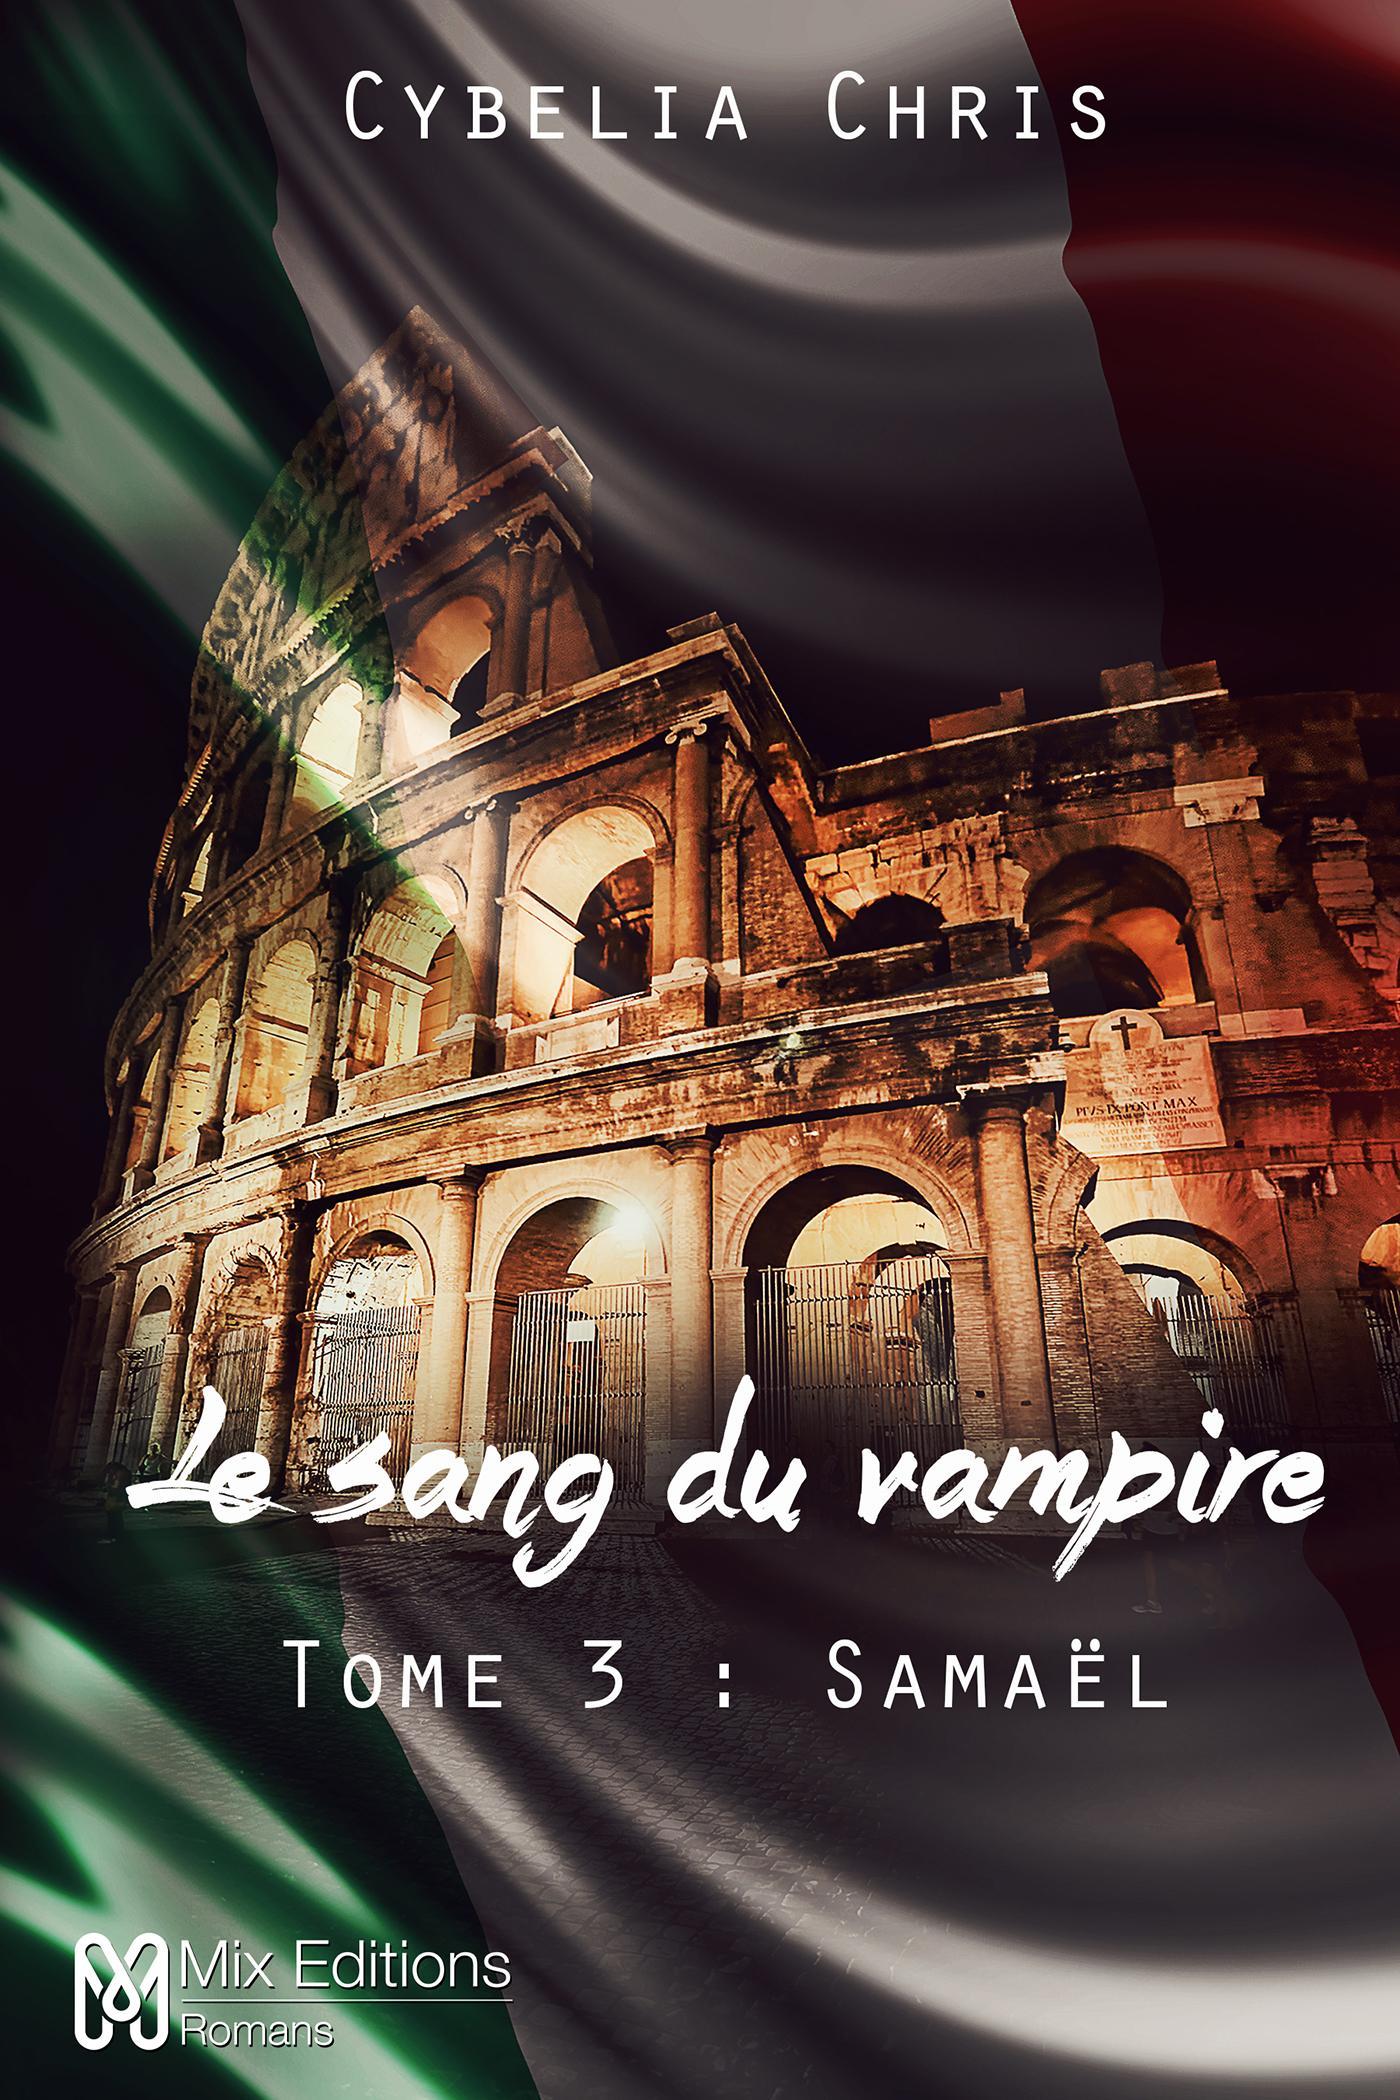 Le sang du Vampire Tome 3 - Samaël, LE SANG DU VAMPIRE